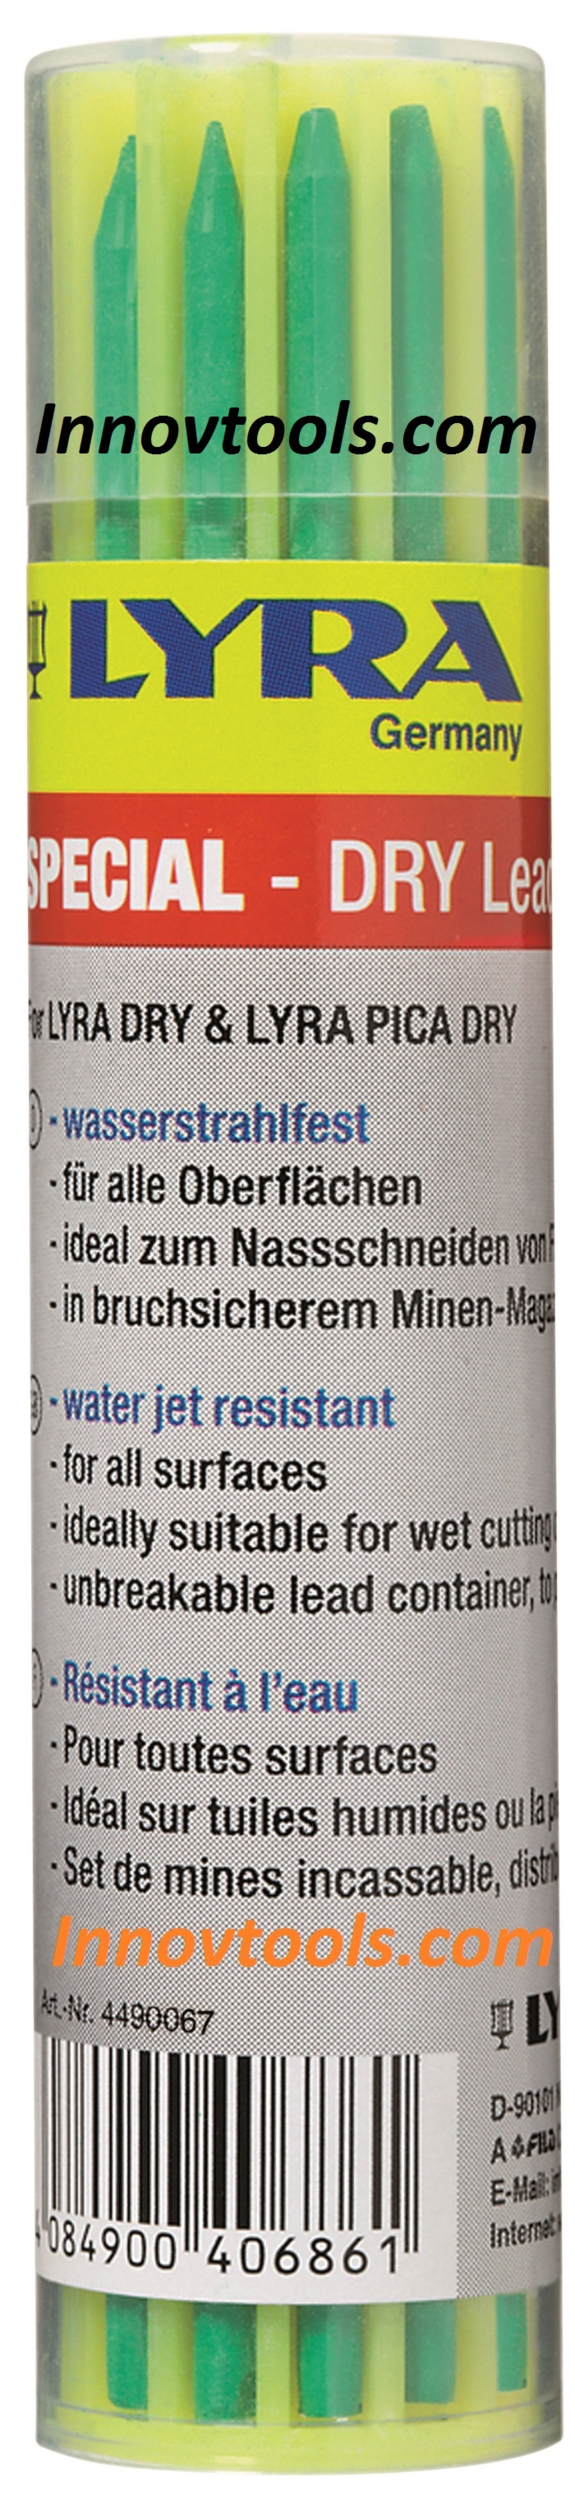 Recharge de 12 Mines LYRA DRY Vertes | Réf. : 4490067